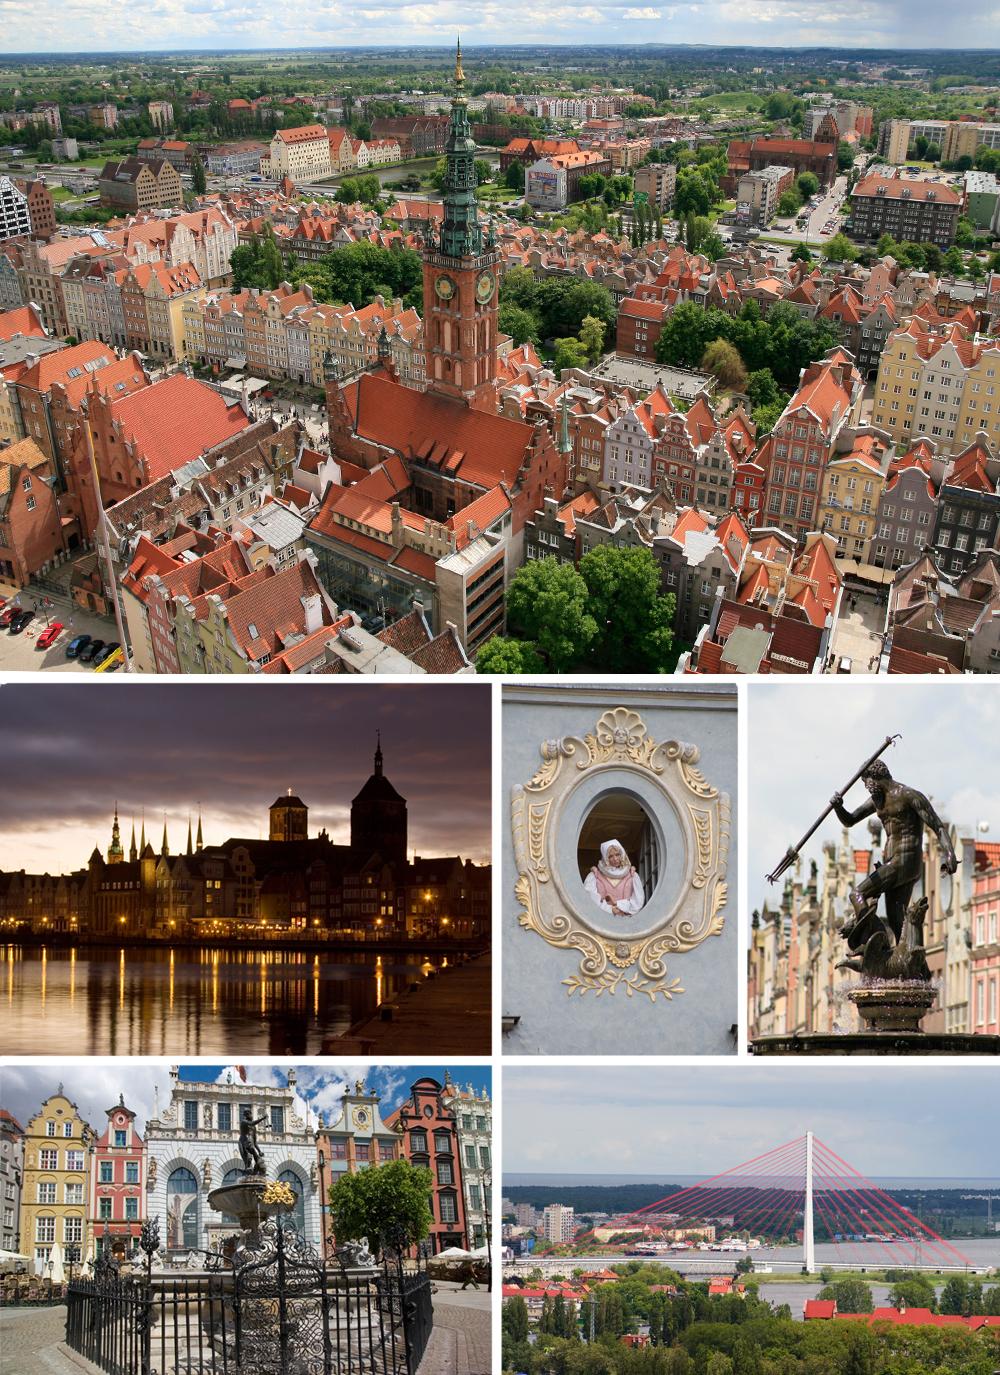 Collage_of_views_of_Gdansk.jpg